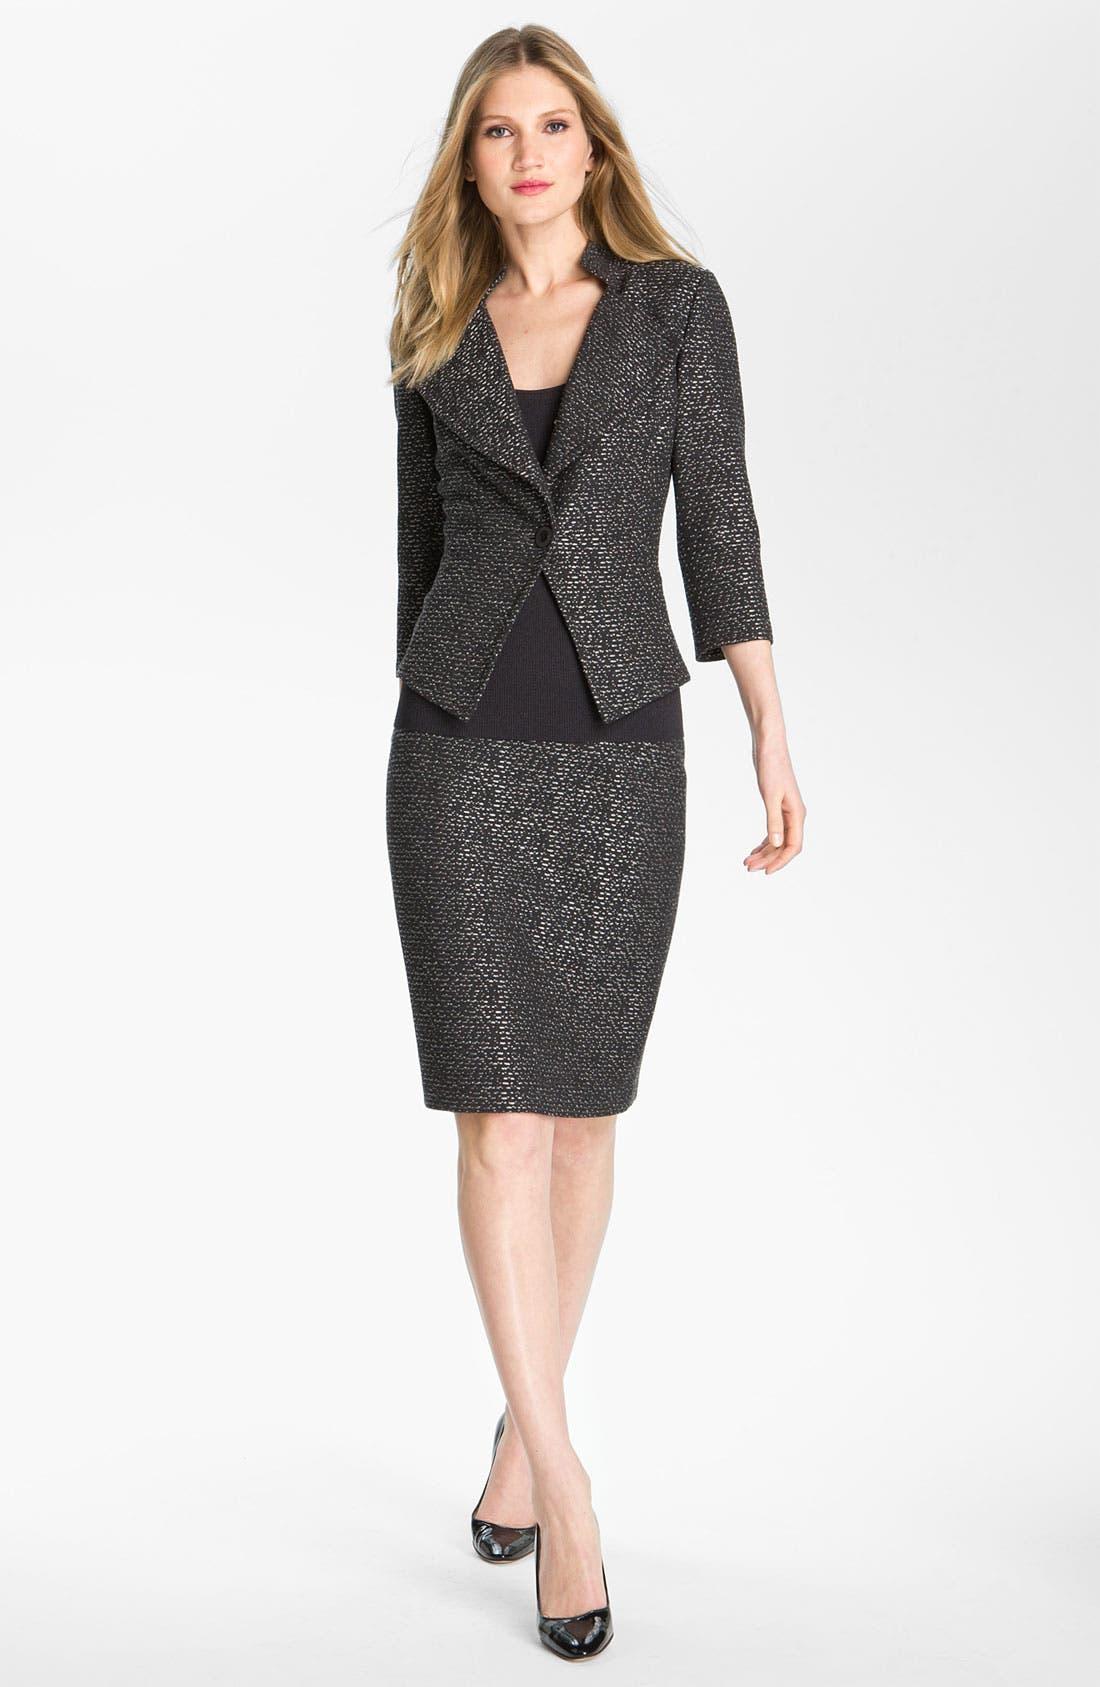 Main Image - St. John Collection Pebble Dash Tweed Knit Skirt